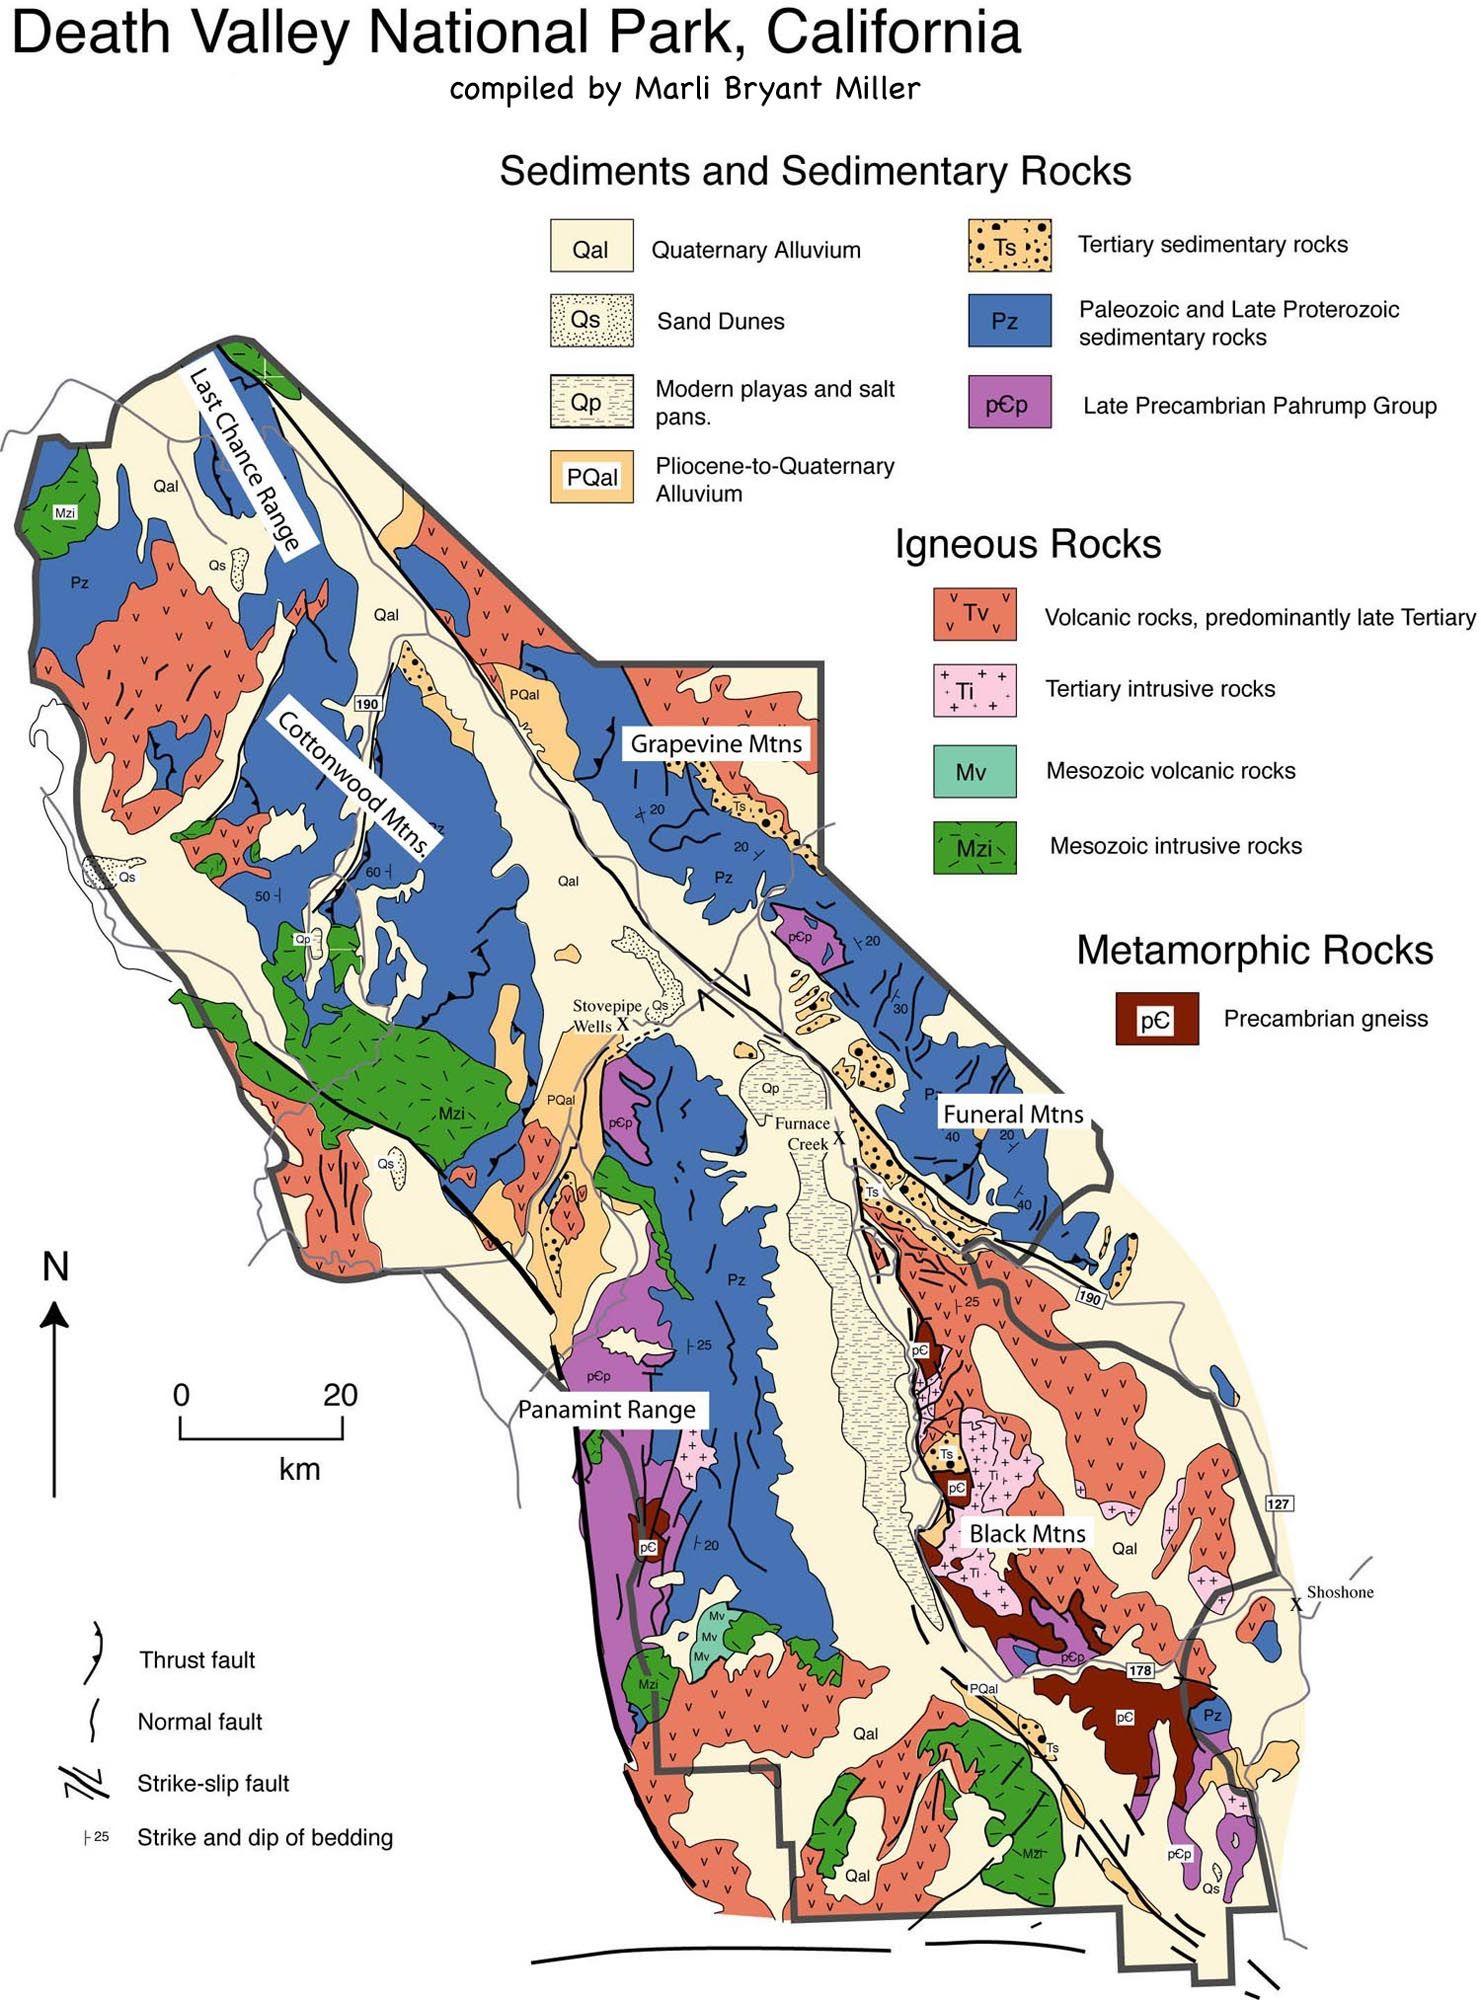 Death Valley Geologic Map | Arizona & California Trip | Pinterest ...